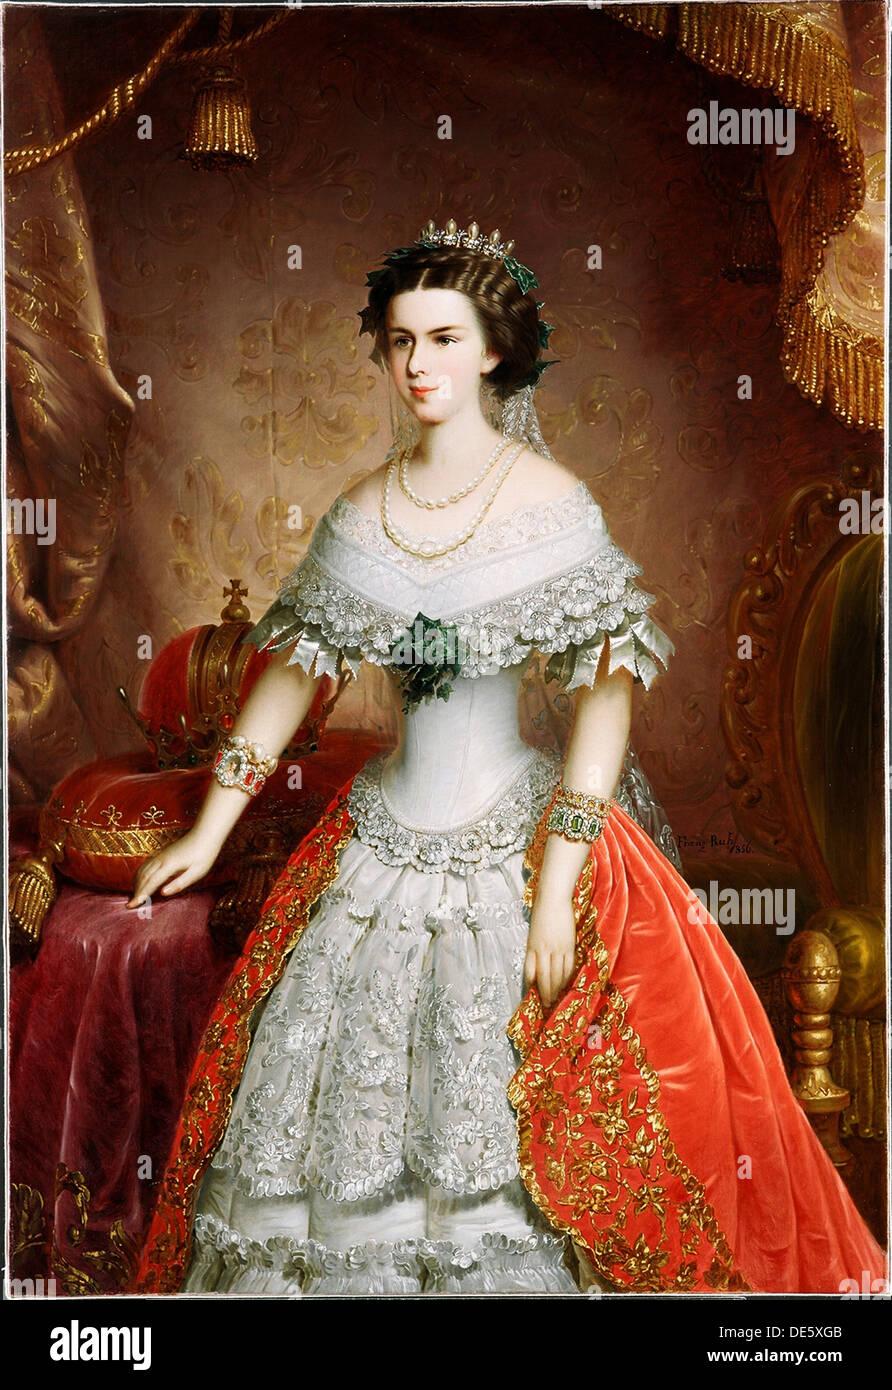 Portrait of Elisabeth of Bavaria, 1856. Artist: Russ, Franz, the Elder (1817-1892) - Stock Image